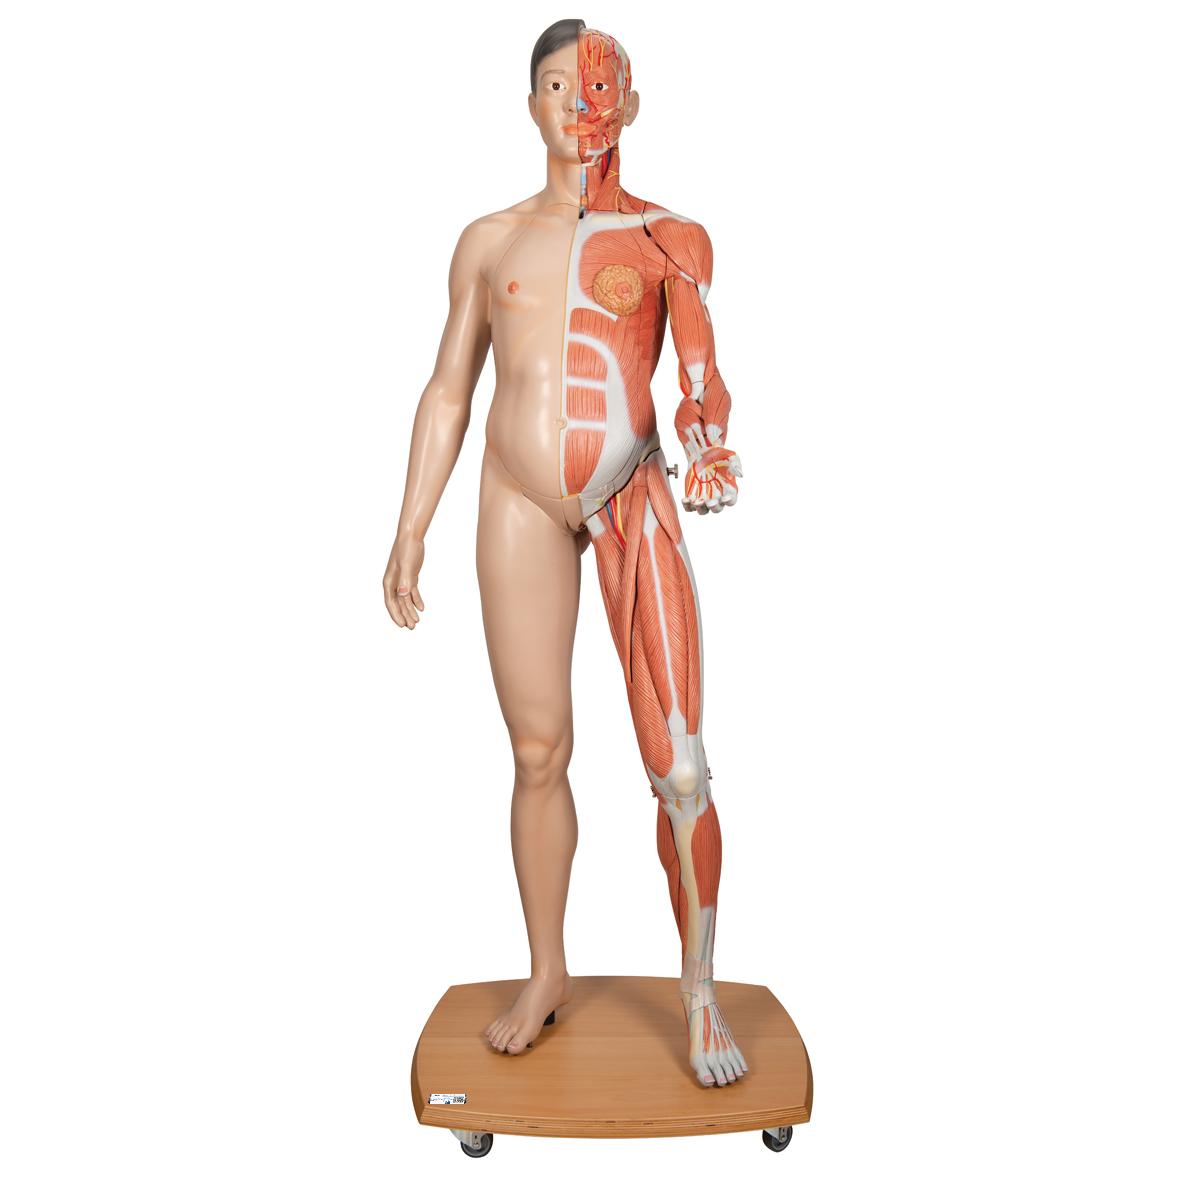 asian human muscular figure model - life-size muscular figure, Muscles